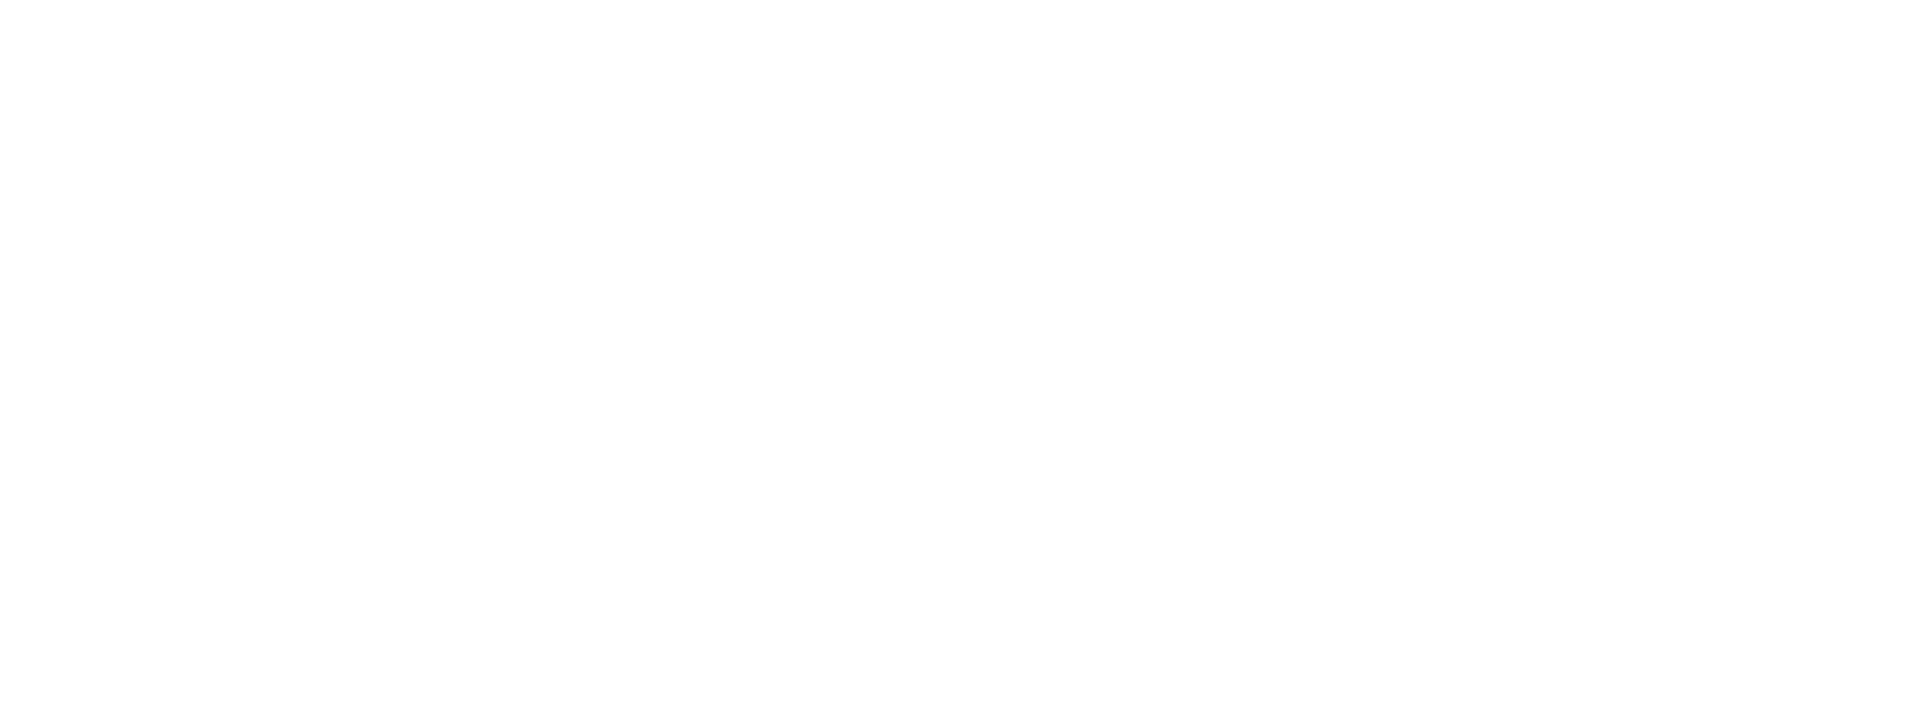 hero shape